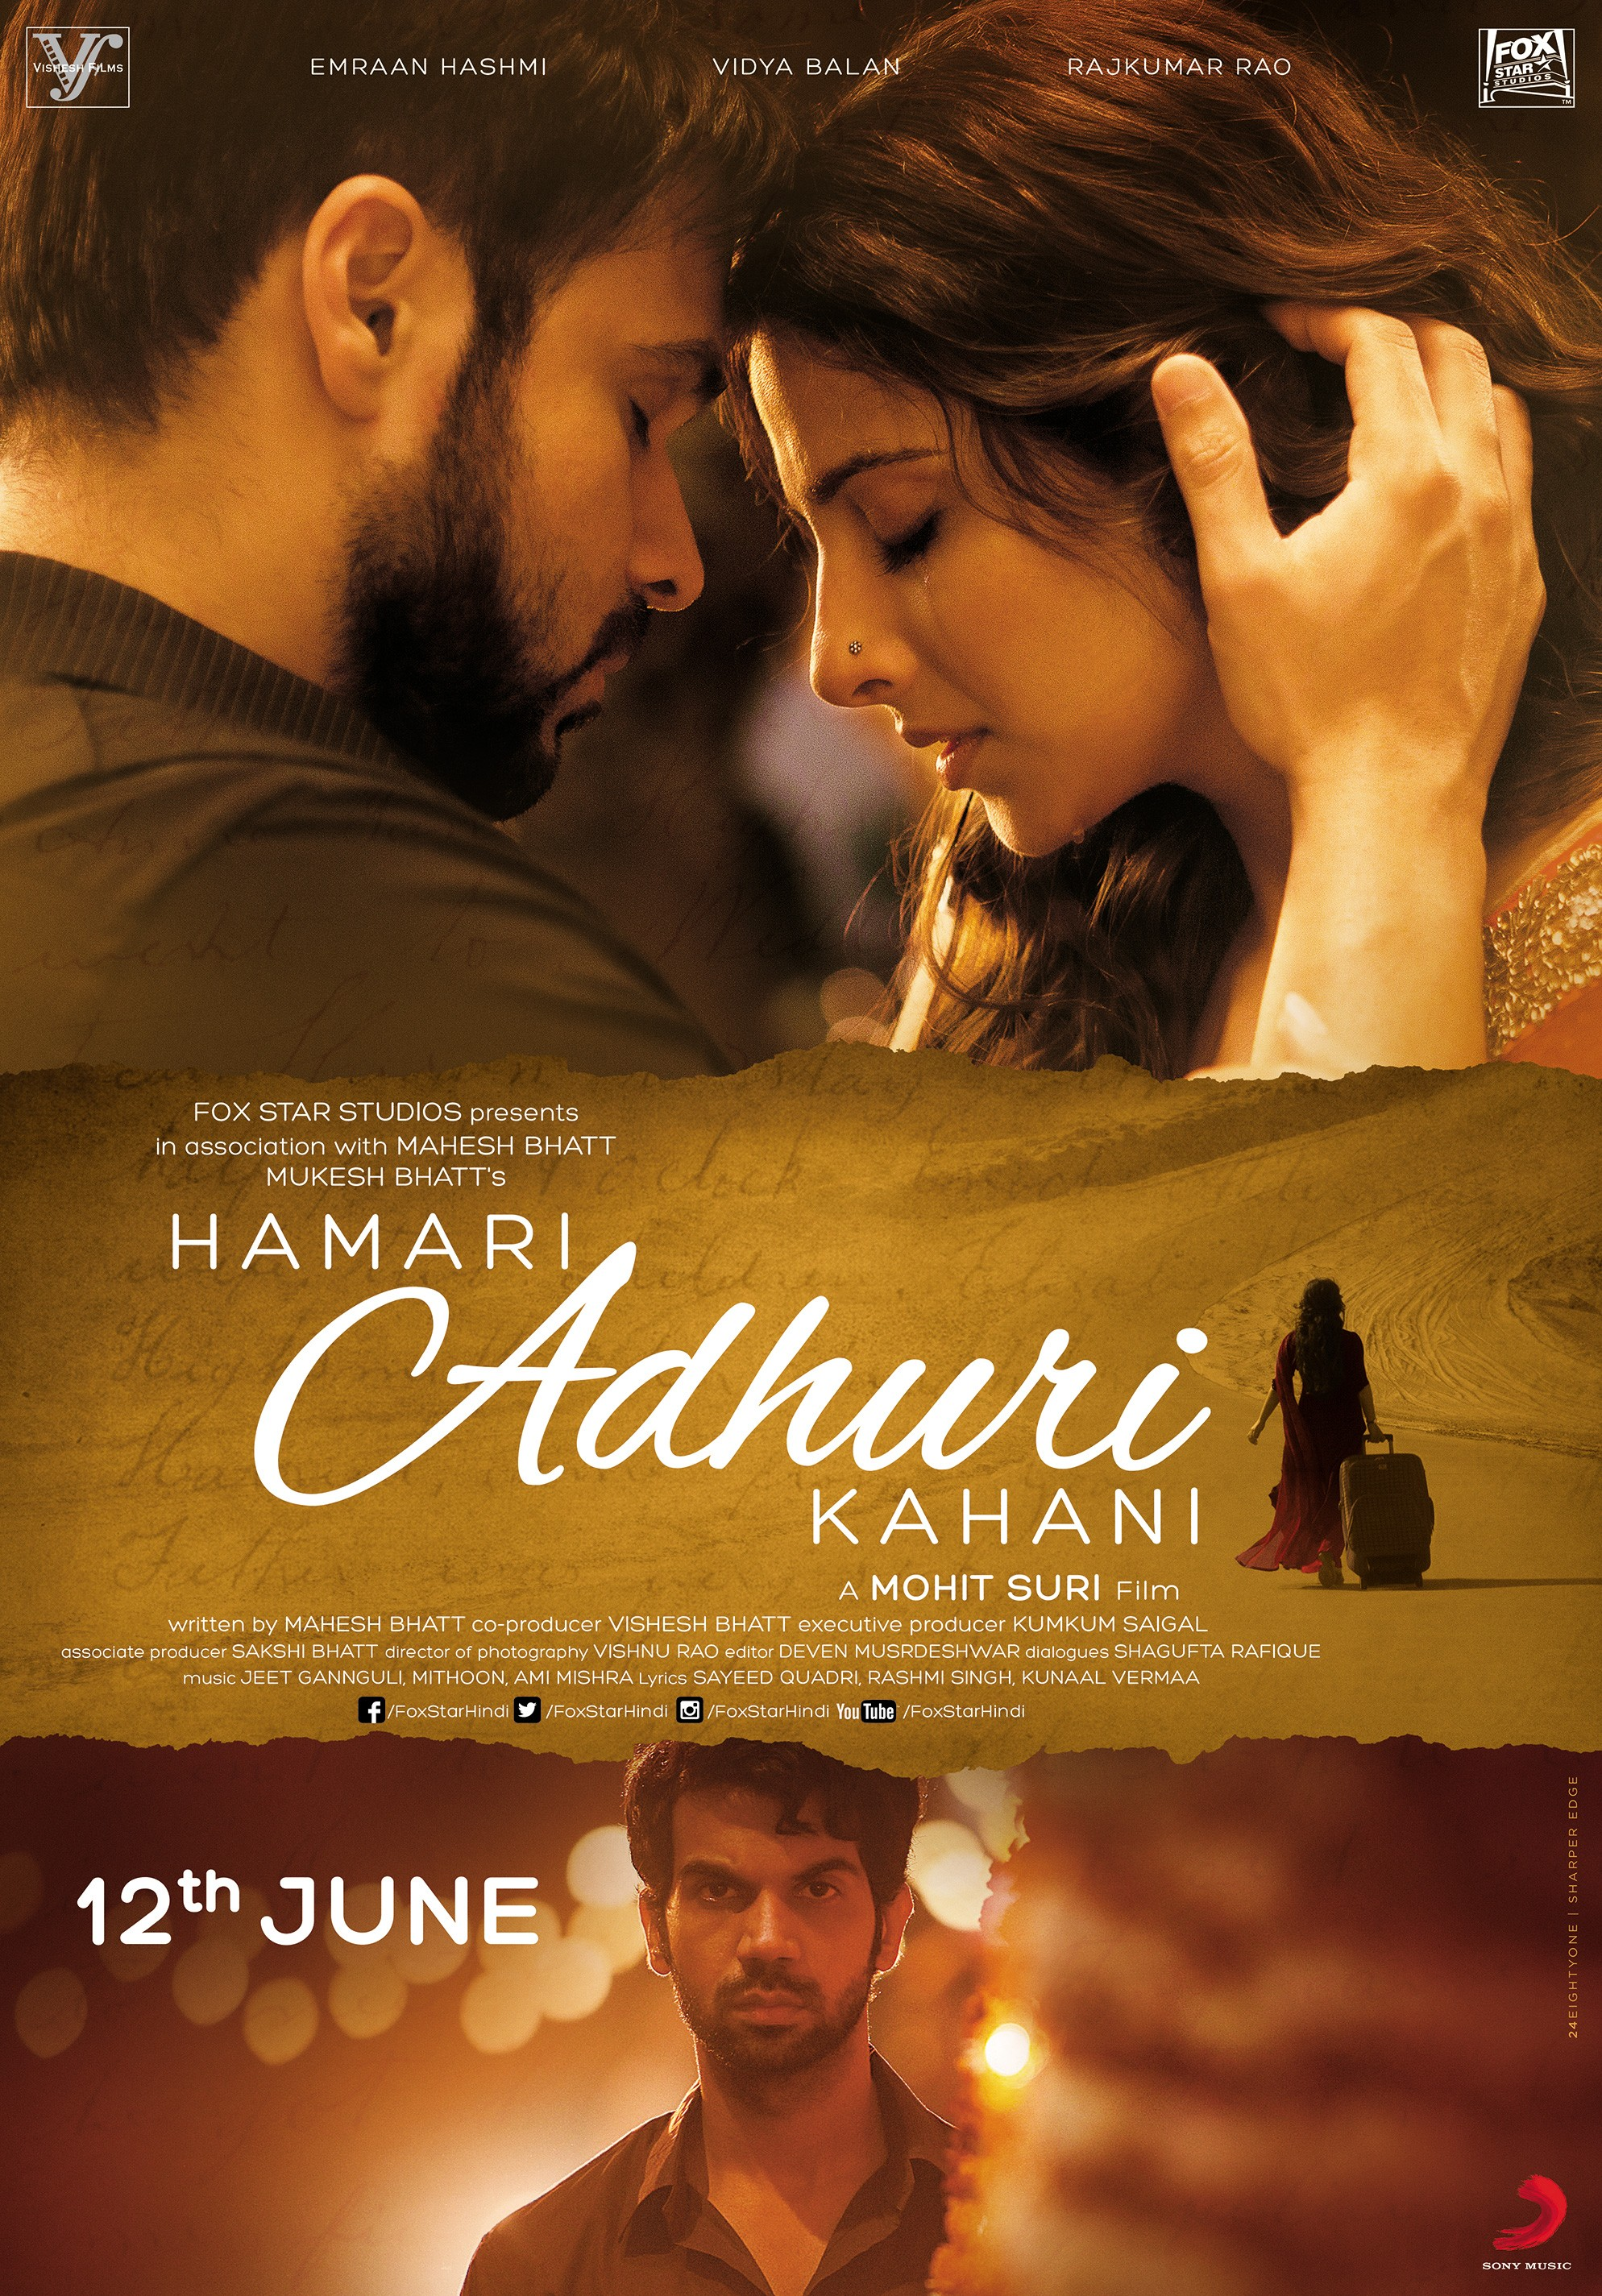 Hamari Adhuri Kahani (2015) Hindi Full Movie 480p, 720p Download